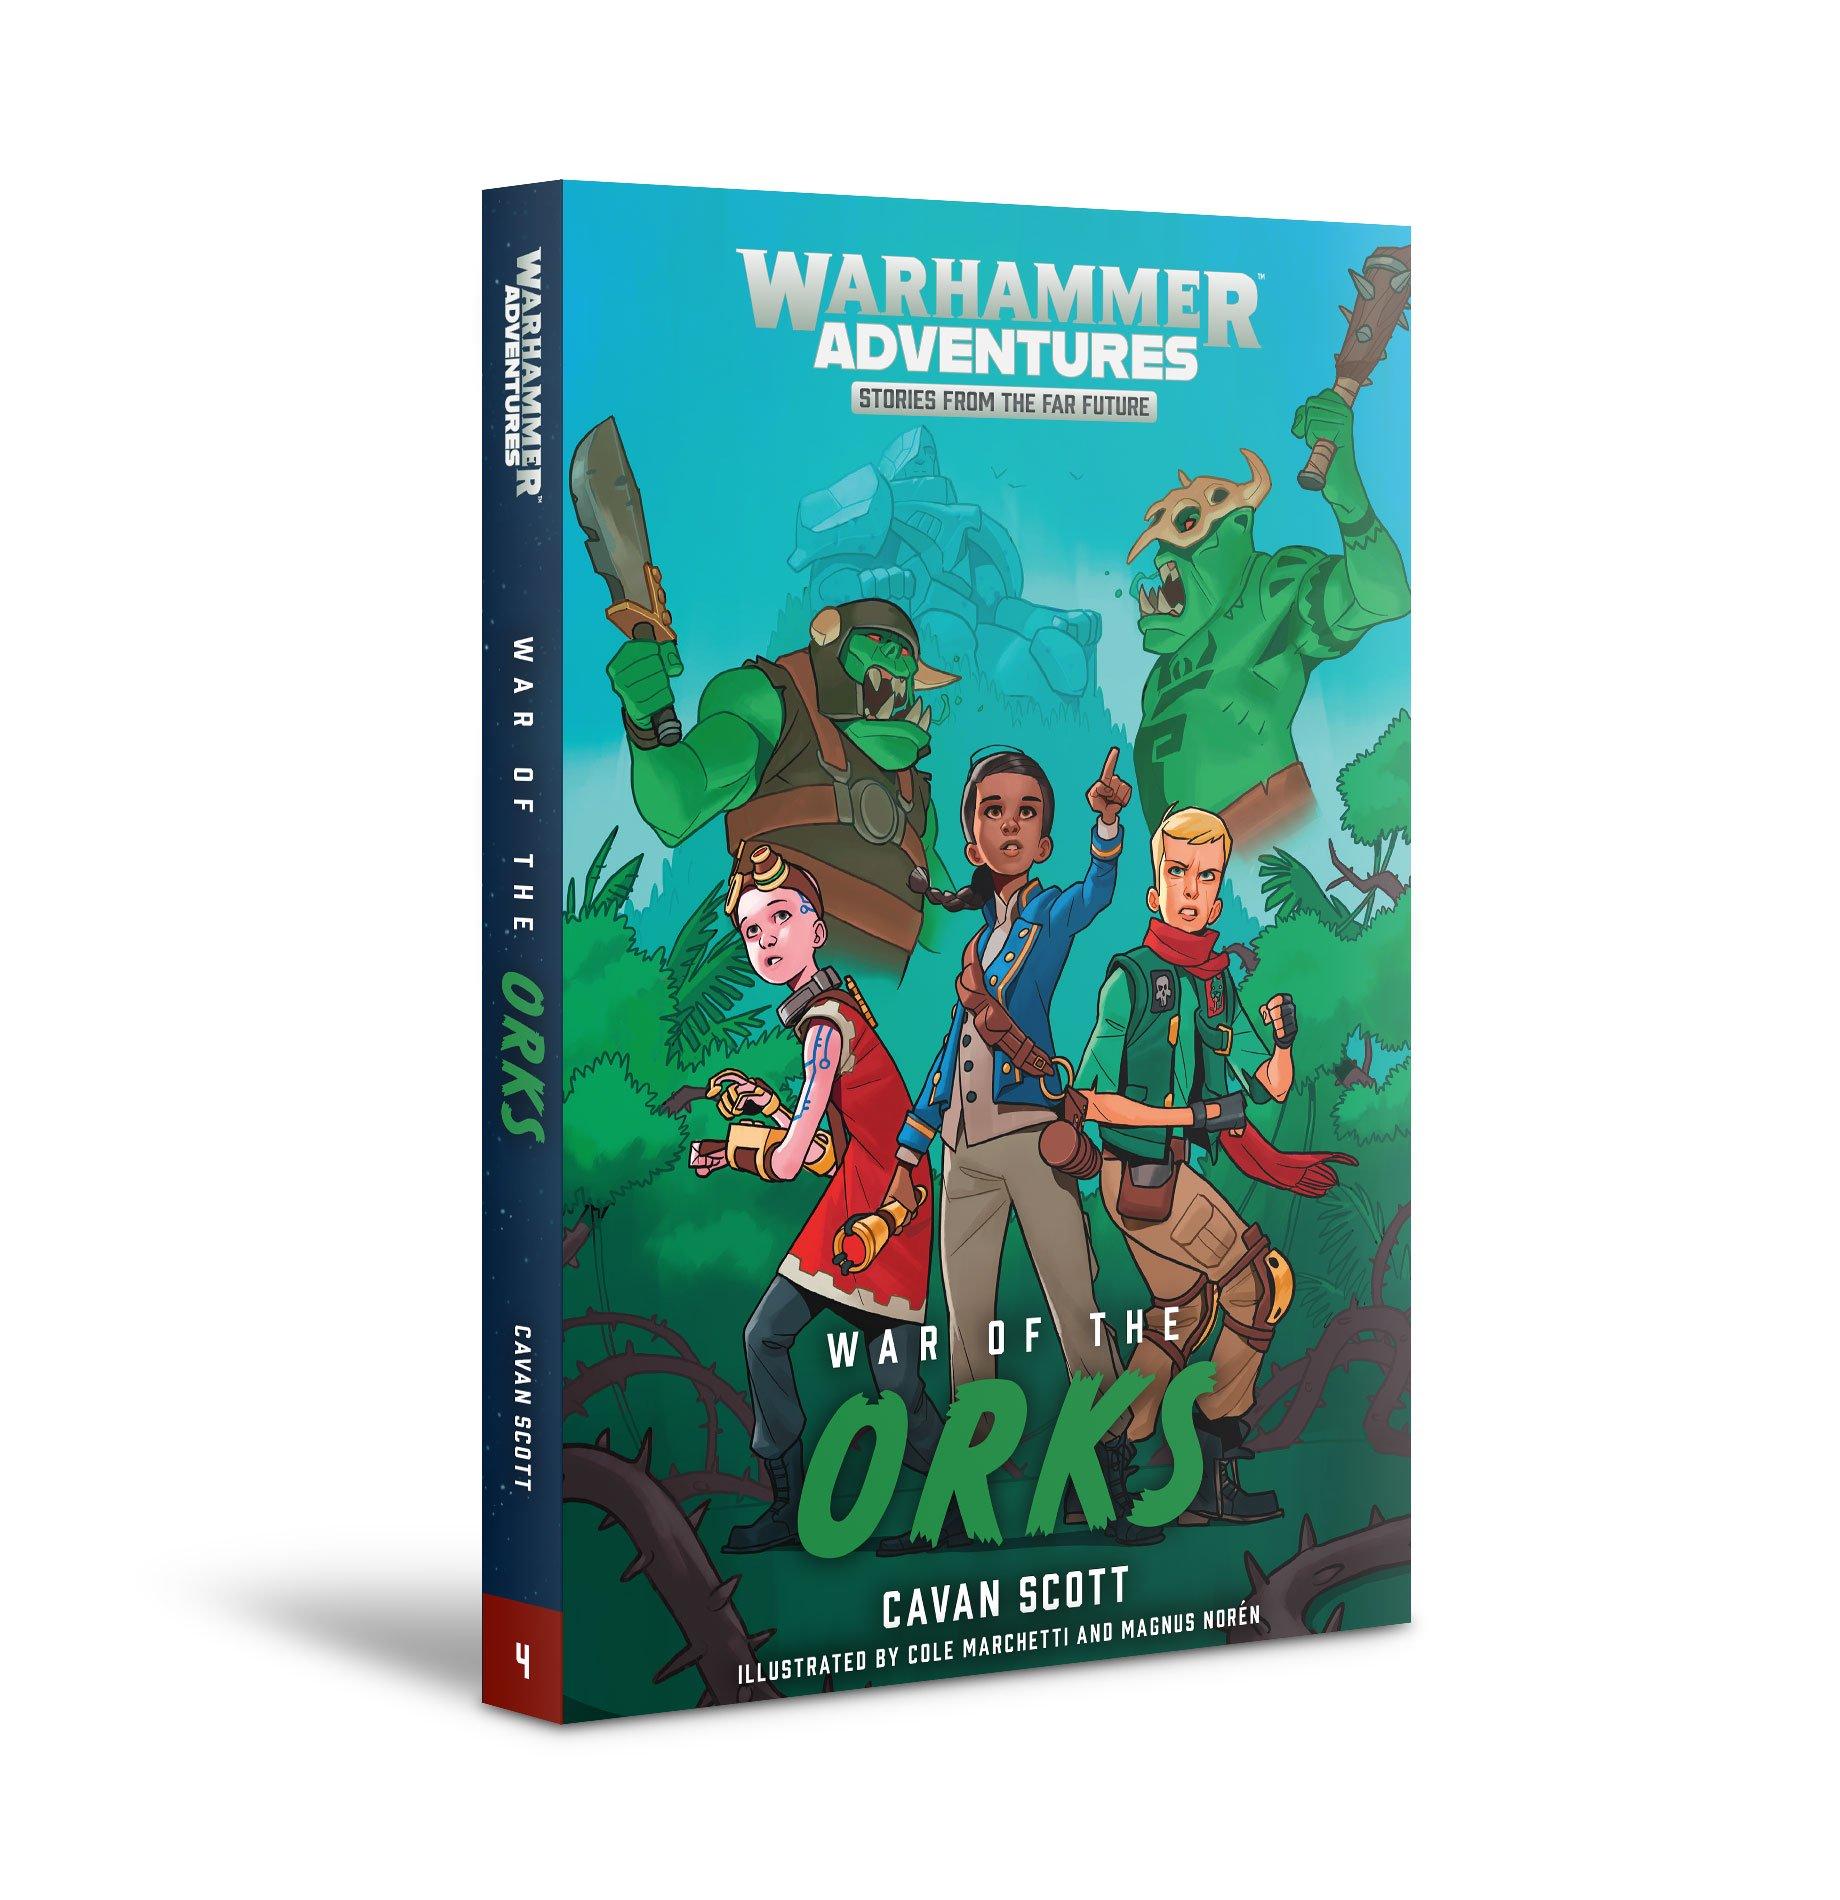 War of the Orks, Warped Galaxies, Black Library